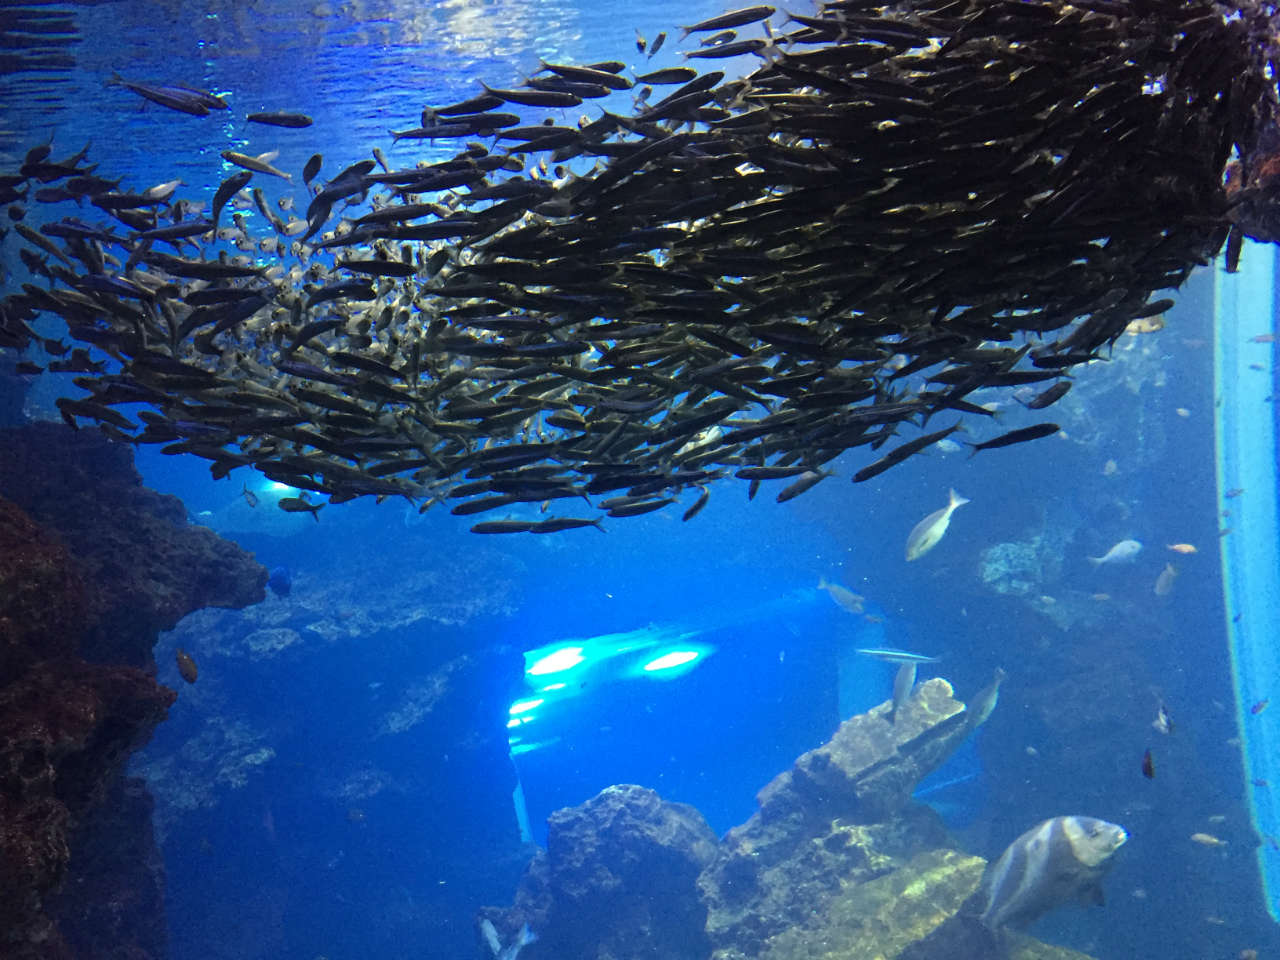 kyoto-aquarium-gyogun